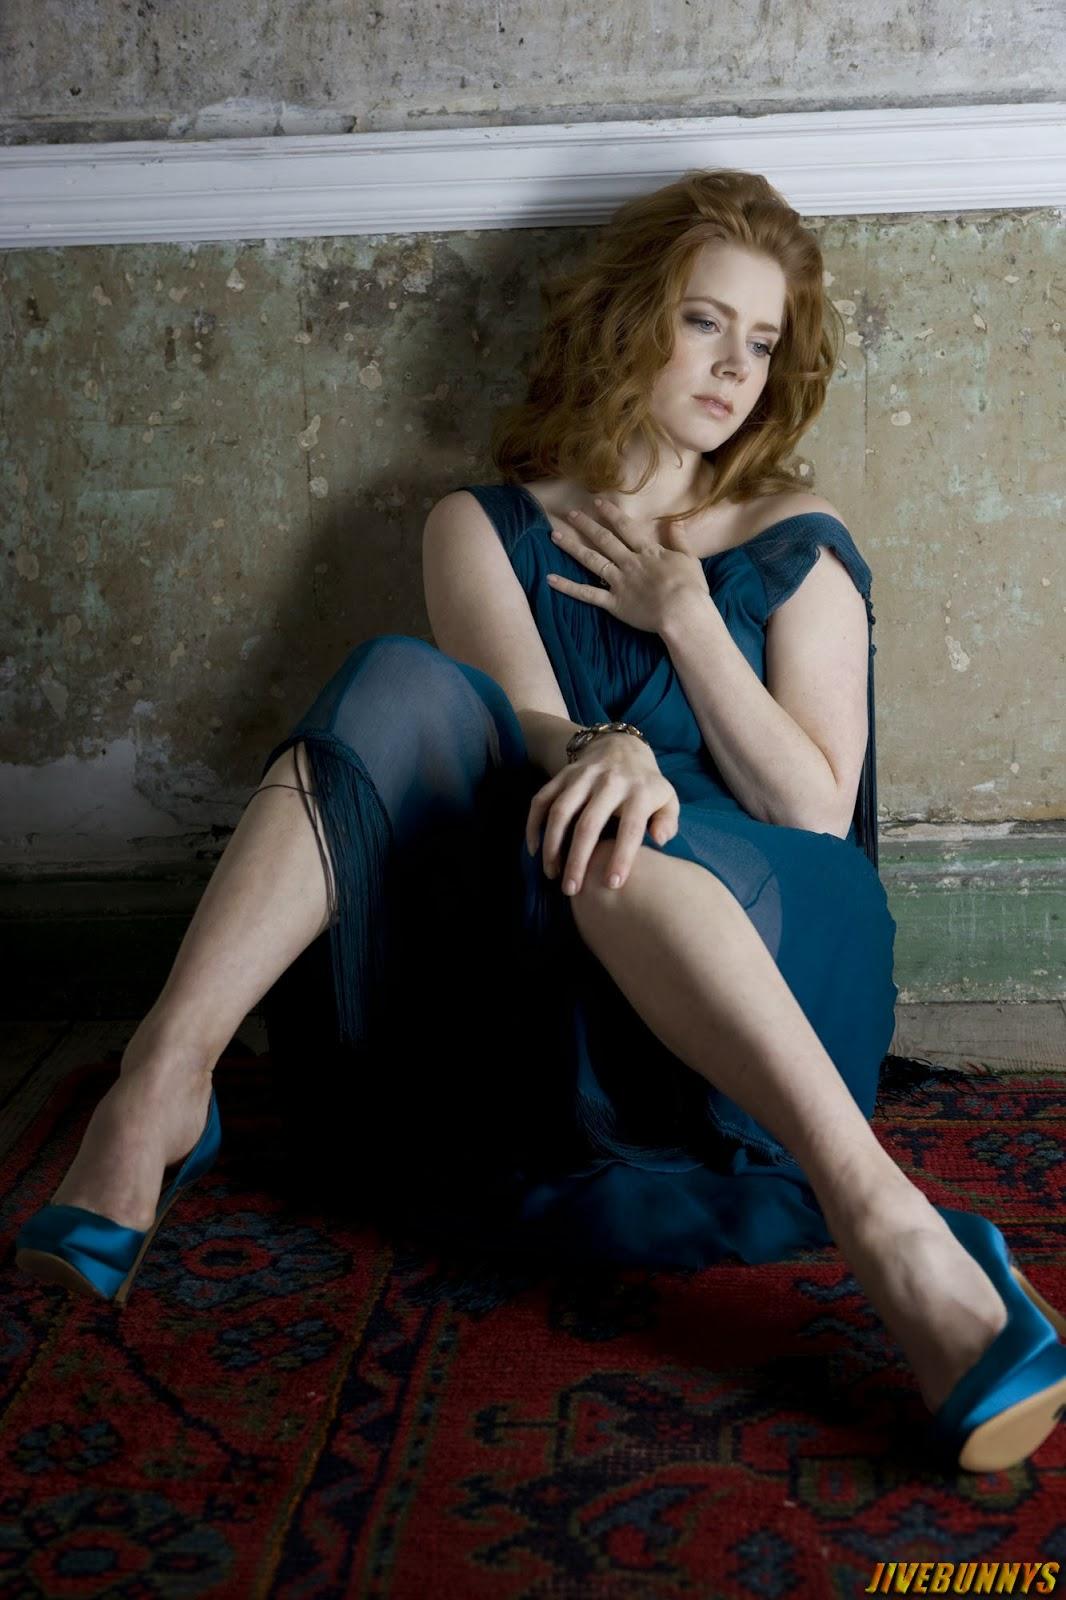 amy adams actress photos gallery 6